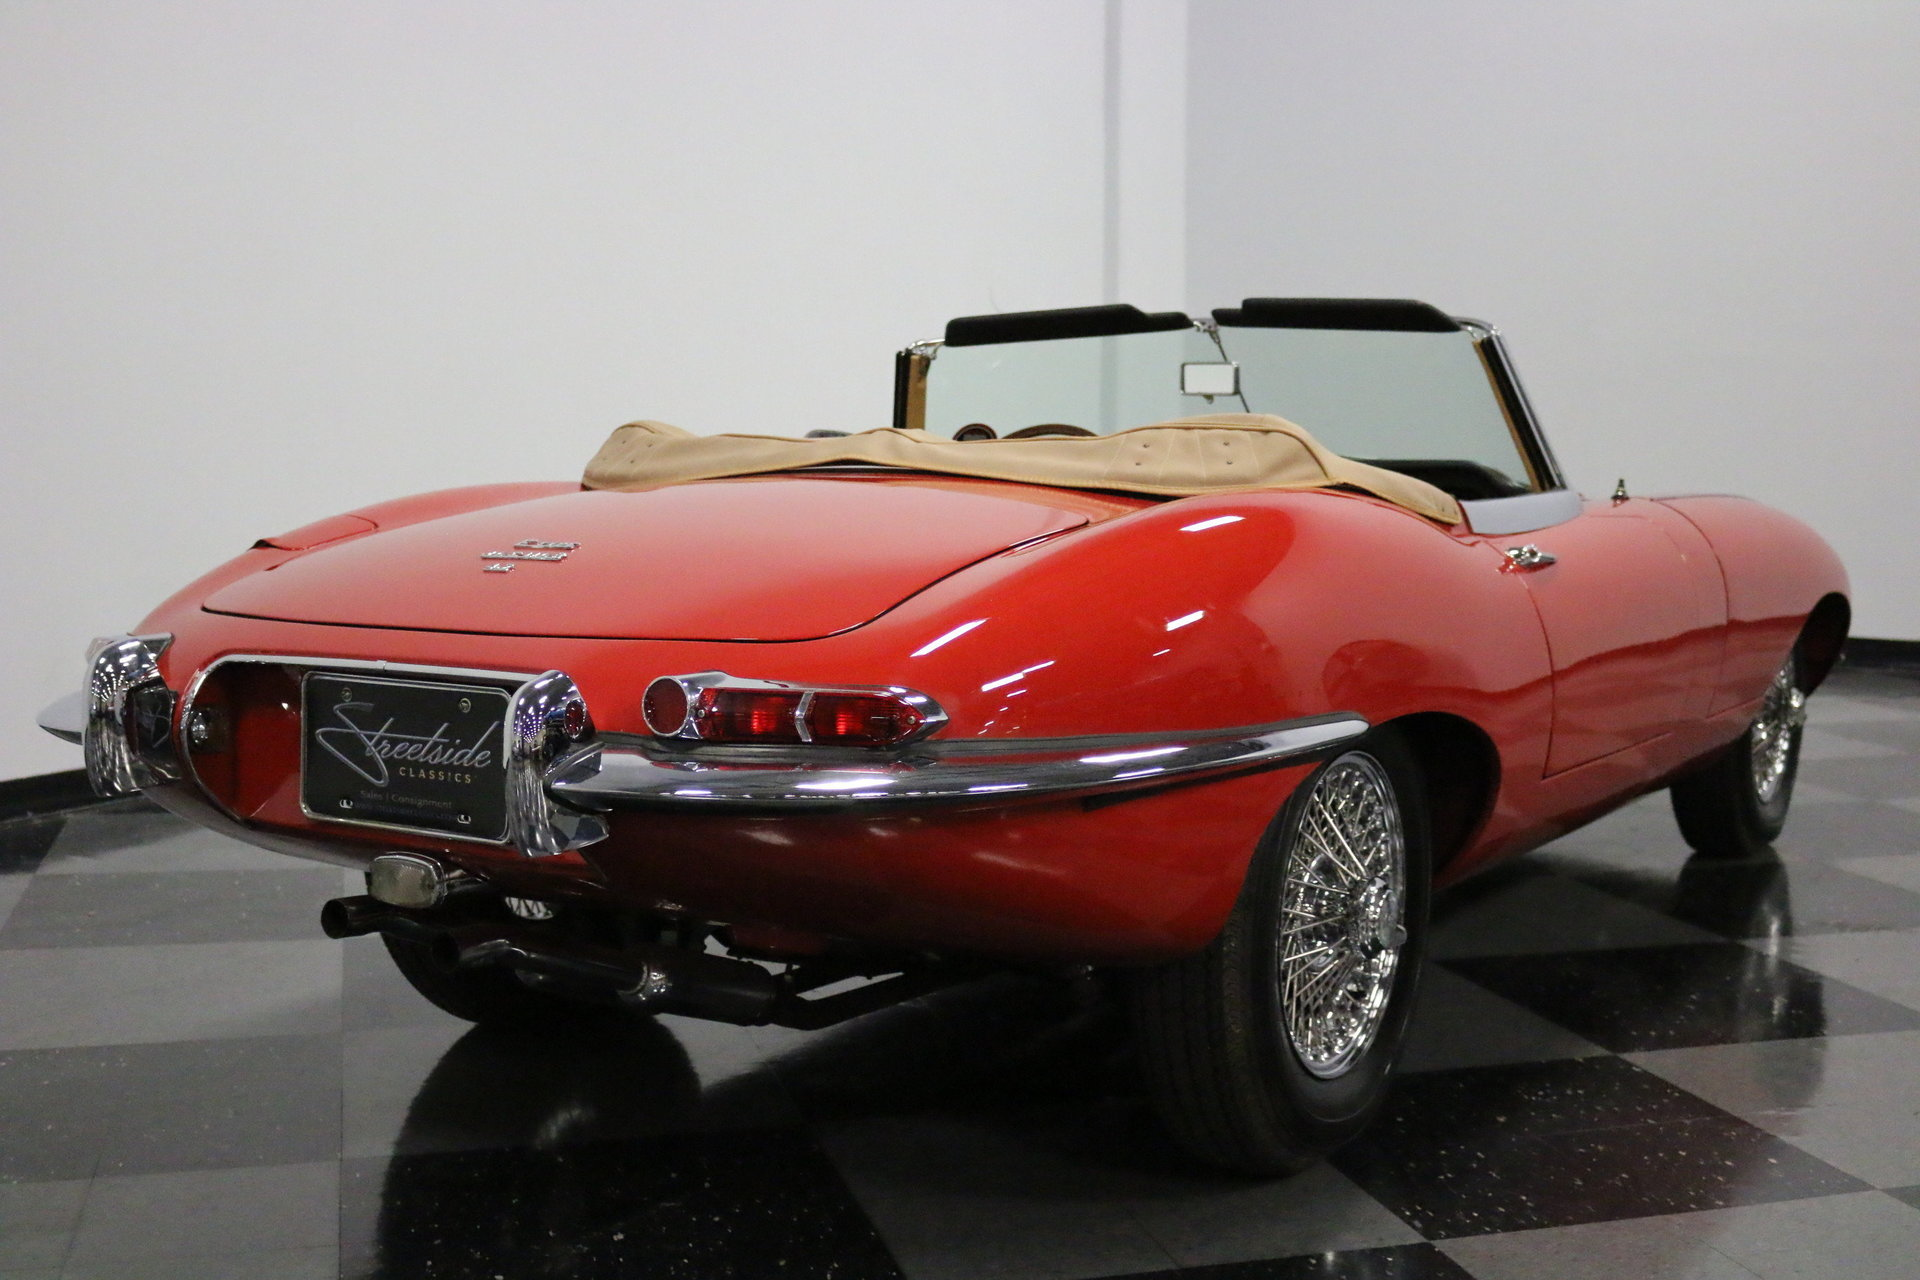 1967 Jaguar E-Type XKE Roadster for sale #50054 | MCG